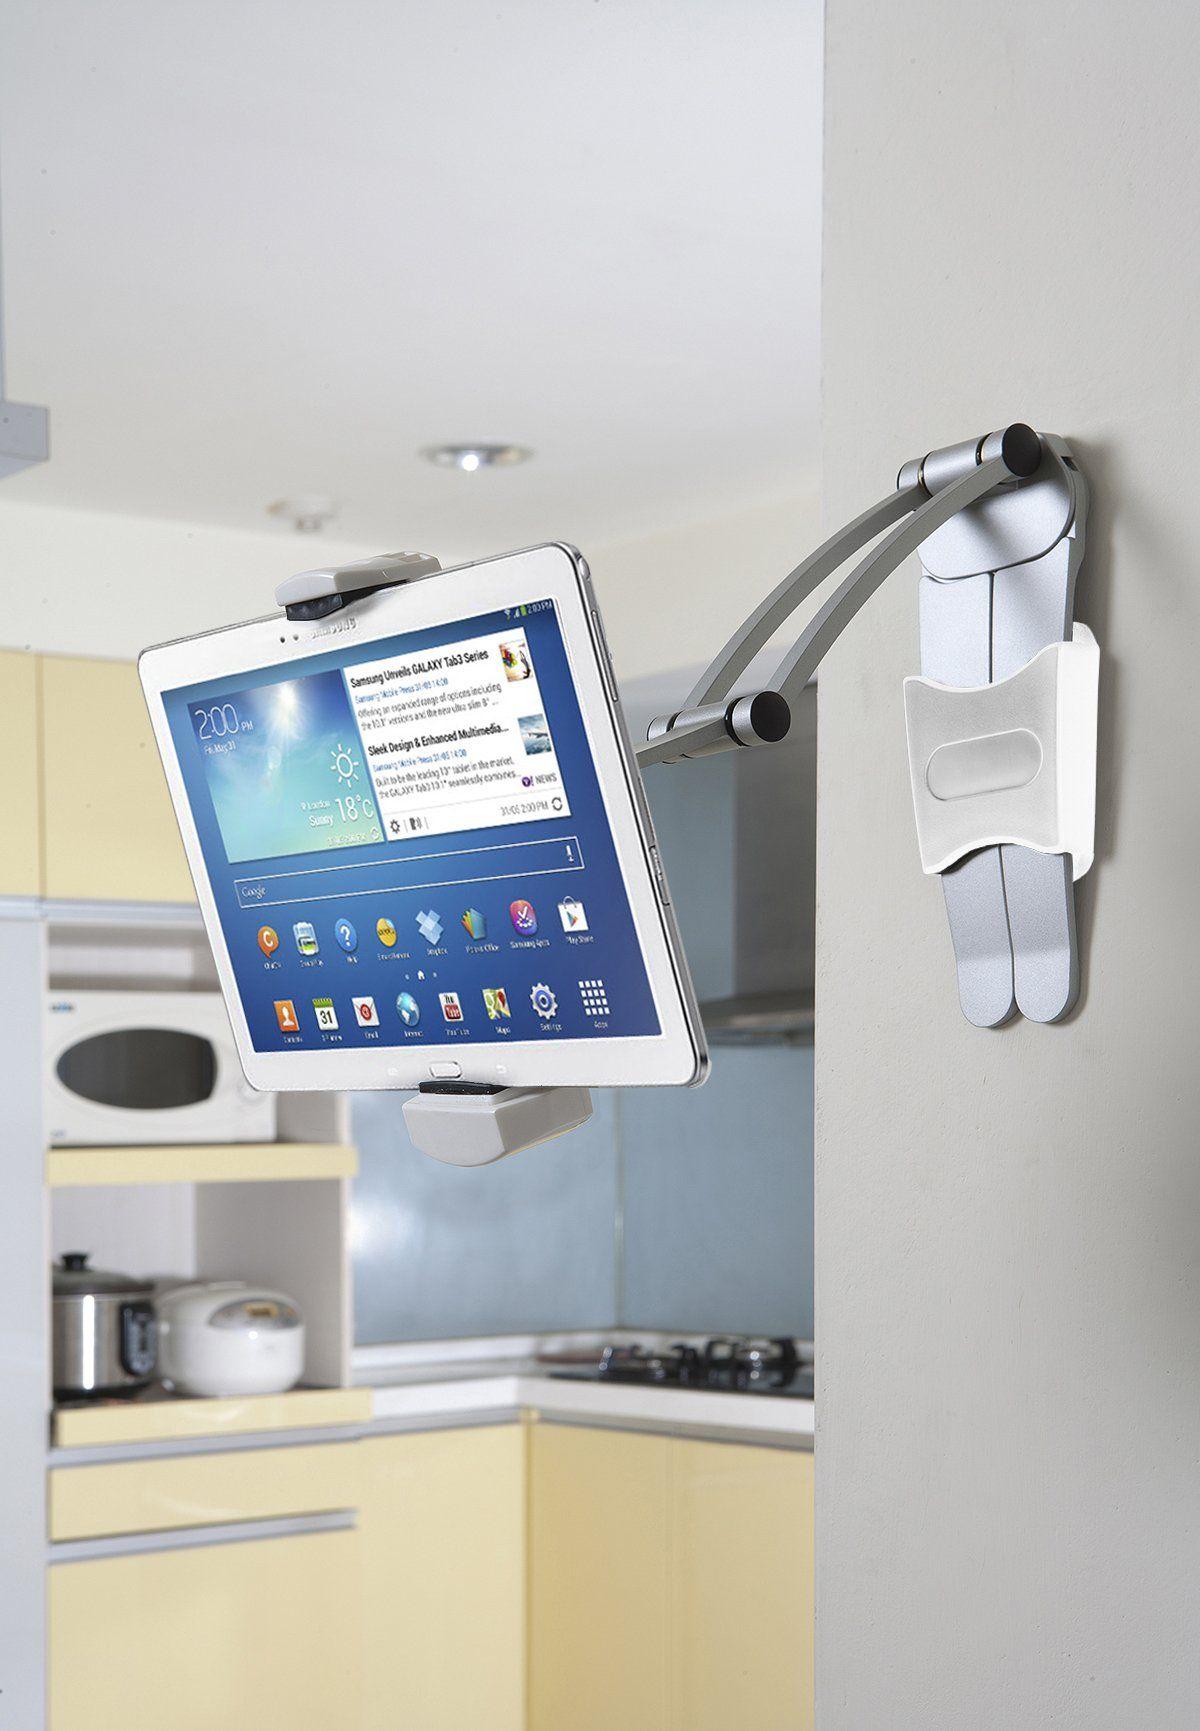 Amazon.com: CTA Digital 2-In-1 Kitchen Mount Stand for iPad Air/iPad ...